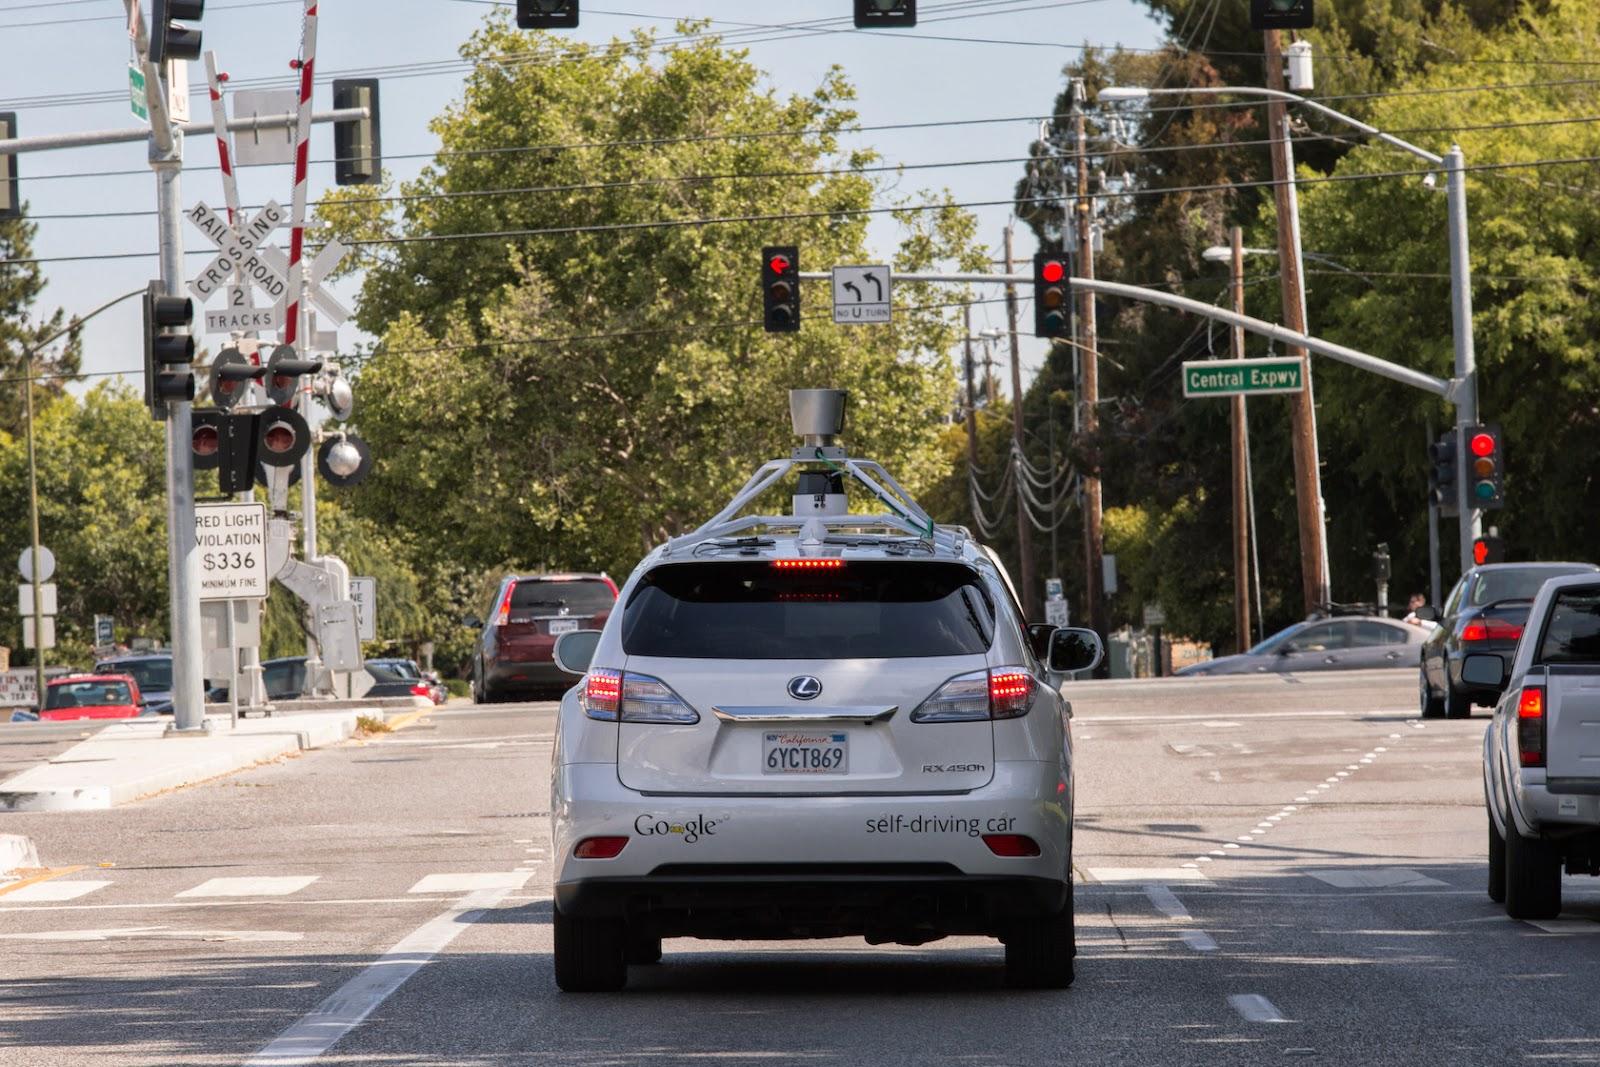 Google self-driving car on a city street